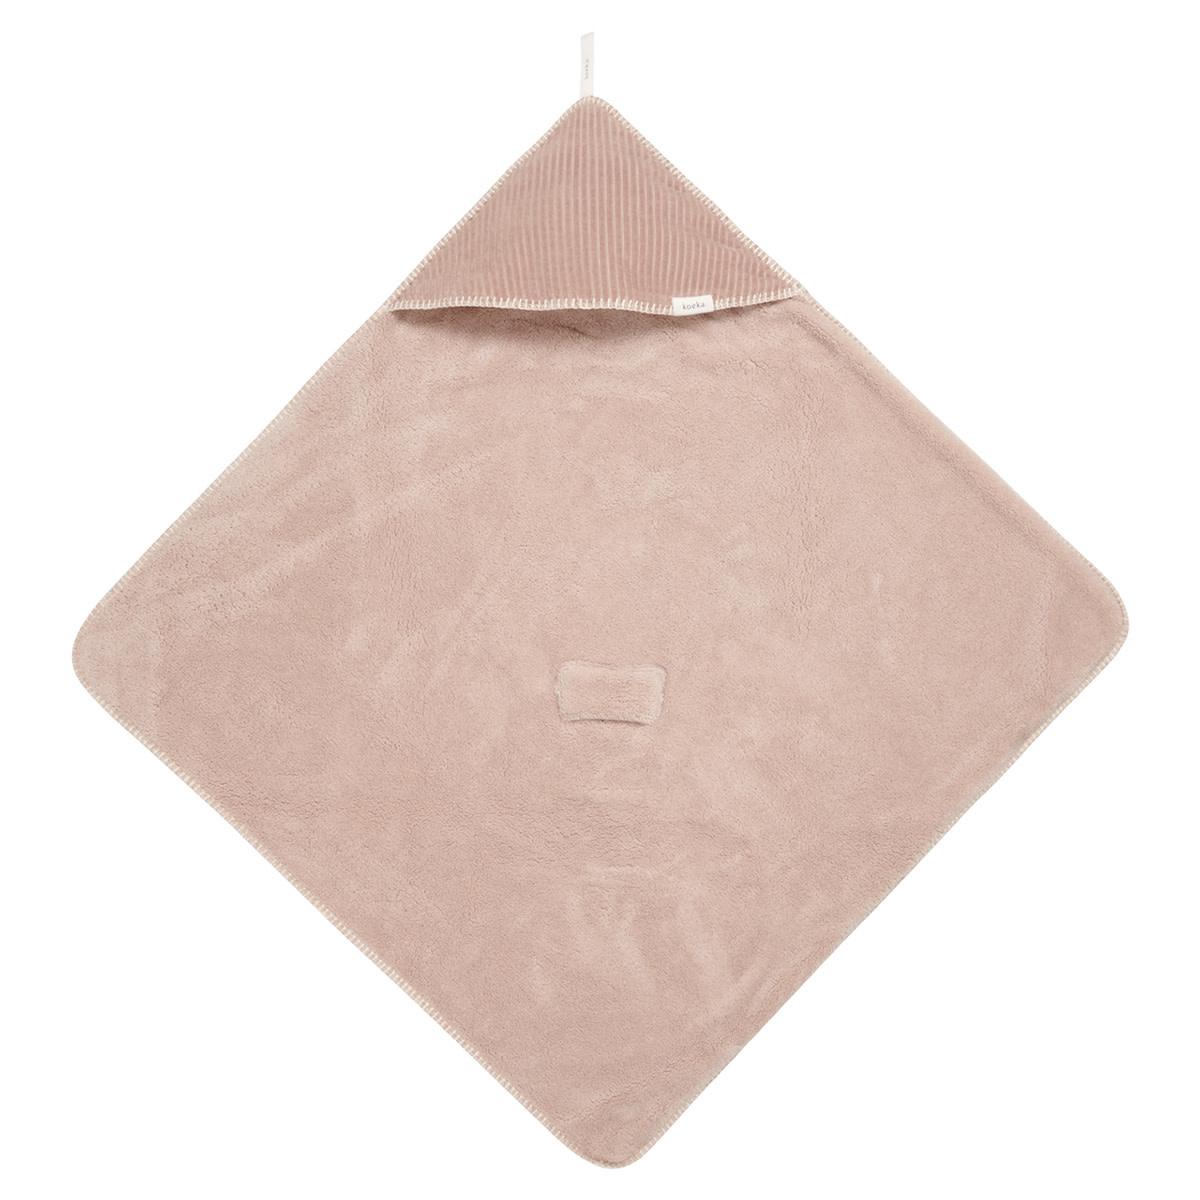 Omslagdoek vik grey pink-1